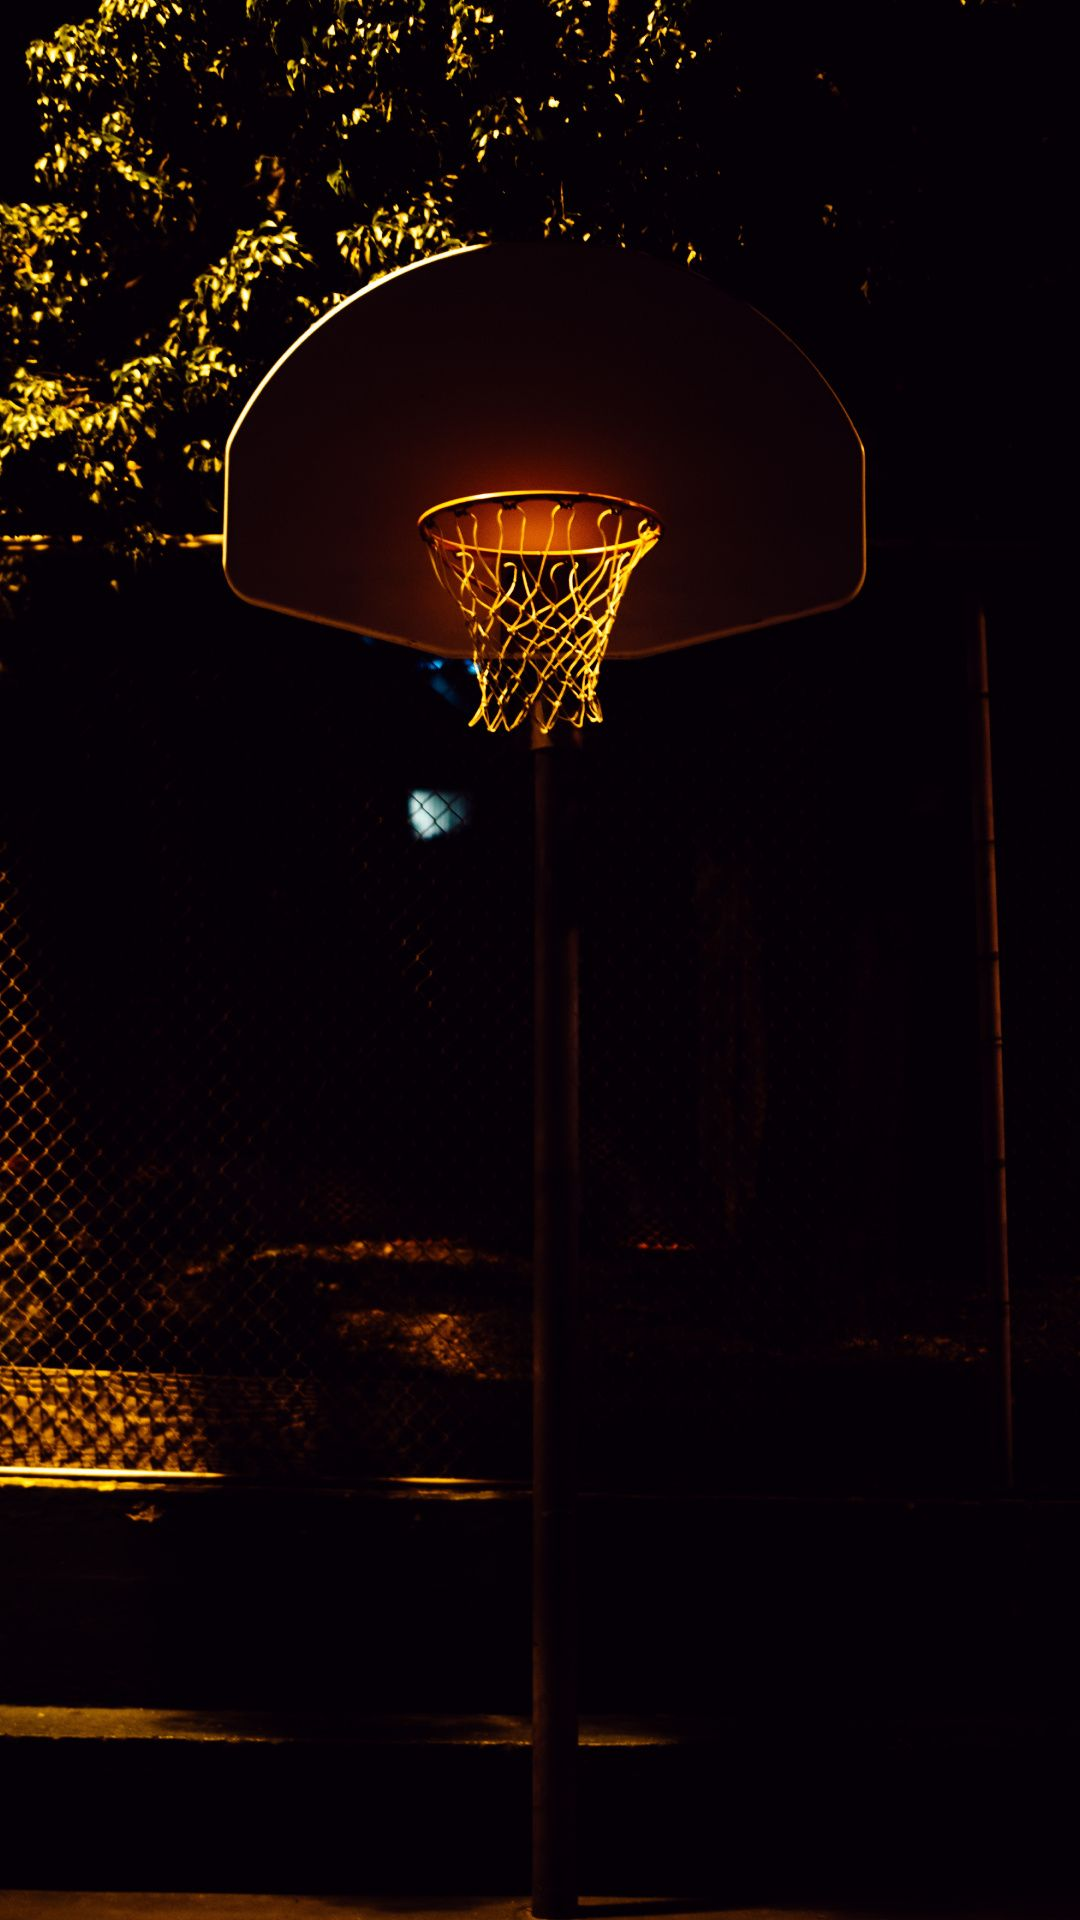 Wallpapers Lighting Sky Light Night Darkness Light Sports Wallpapers Basketball Wallpaper